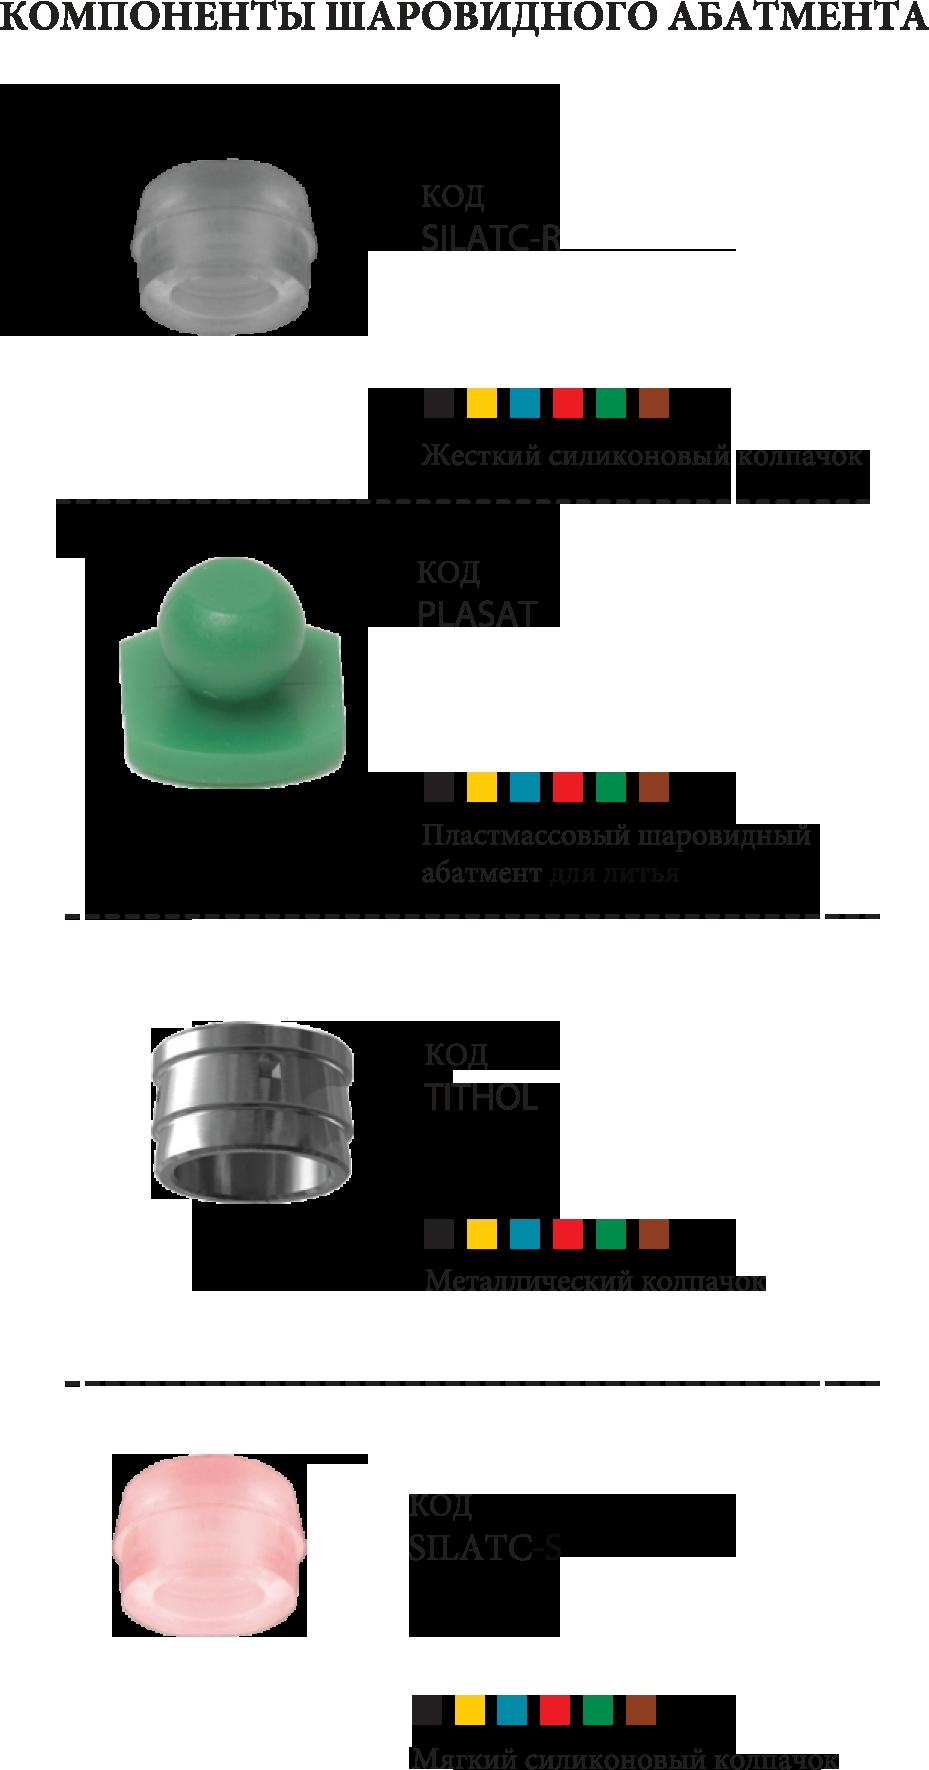 протезные-компоненты-каталог-2 копдия